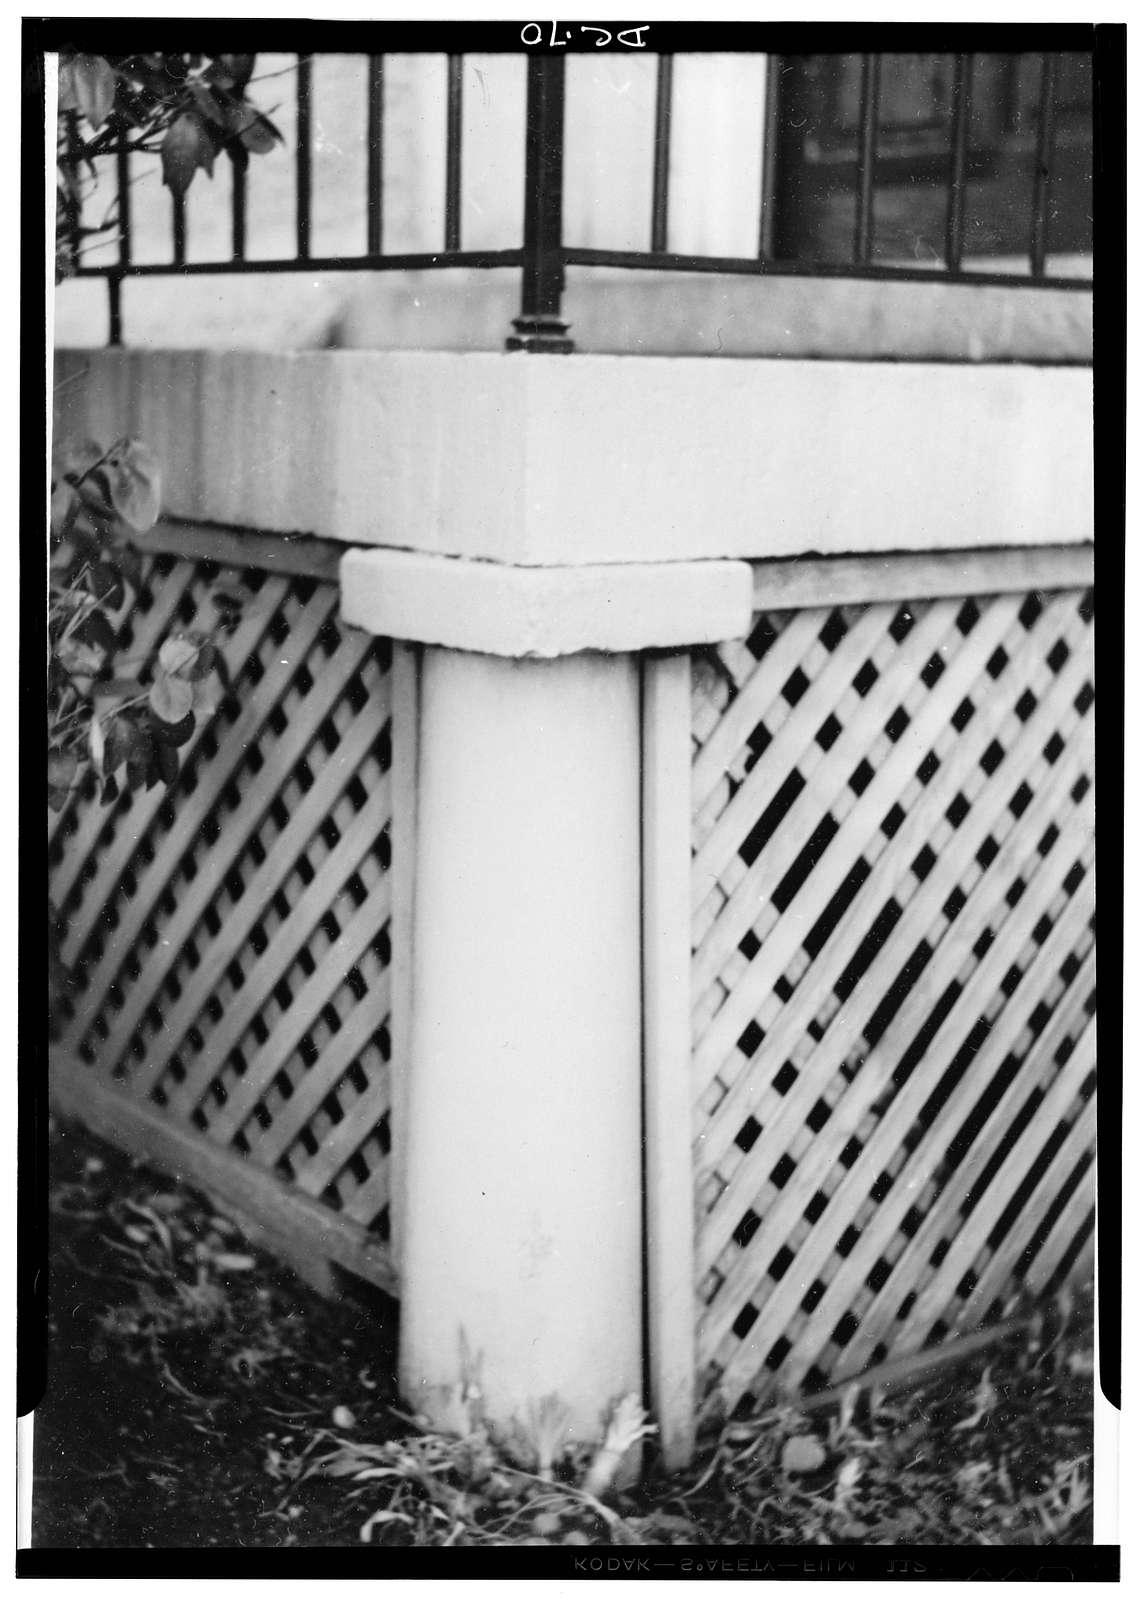 Peter Houses, 2618-2620 K Street Northwest, Washington, District of Columbia, DC